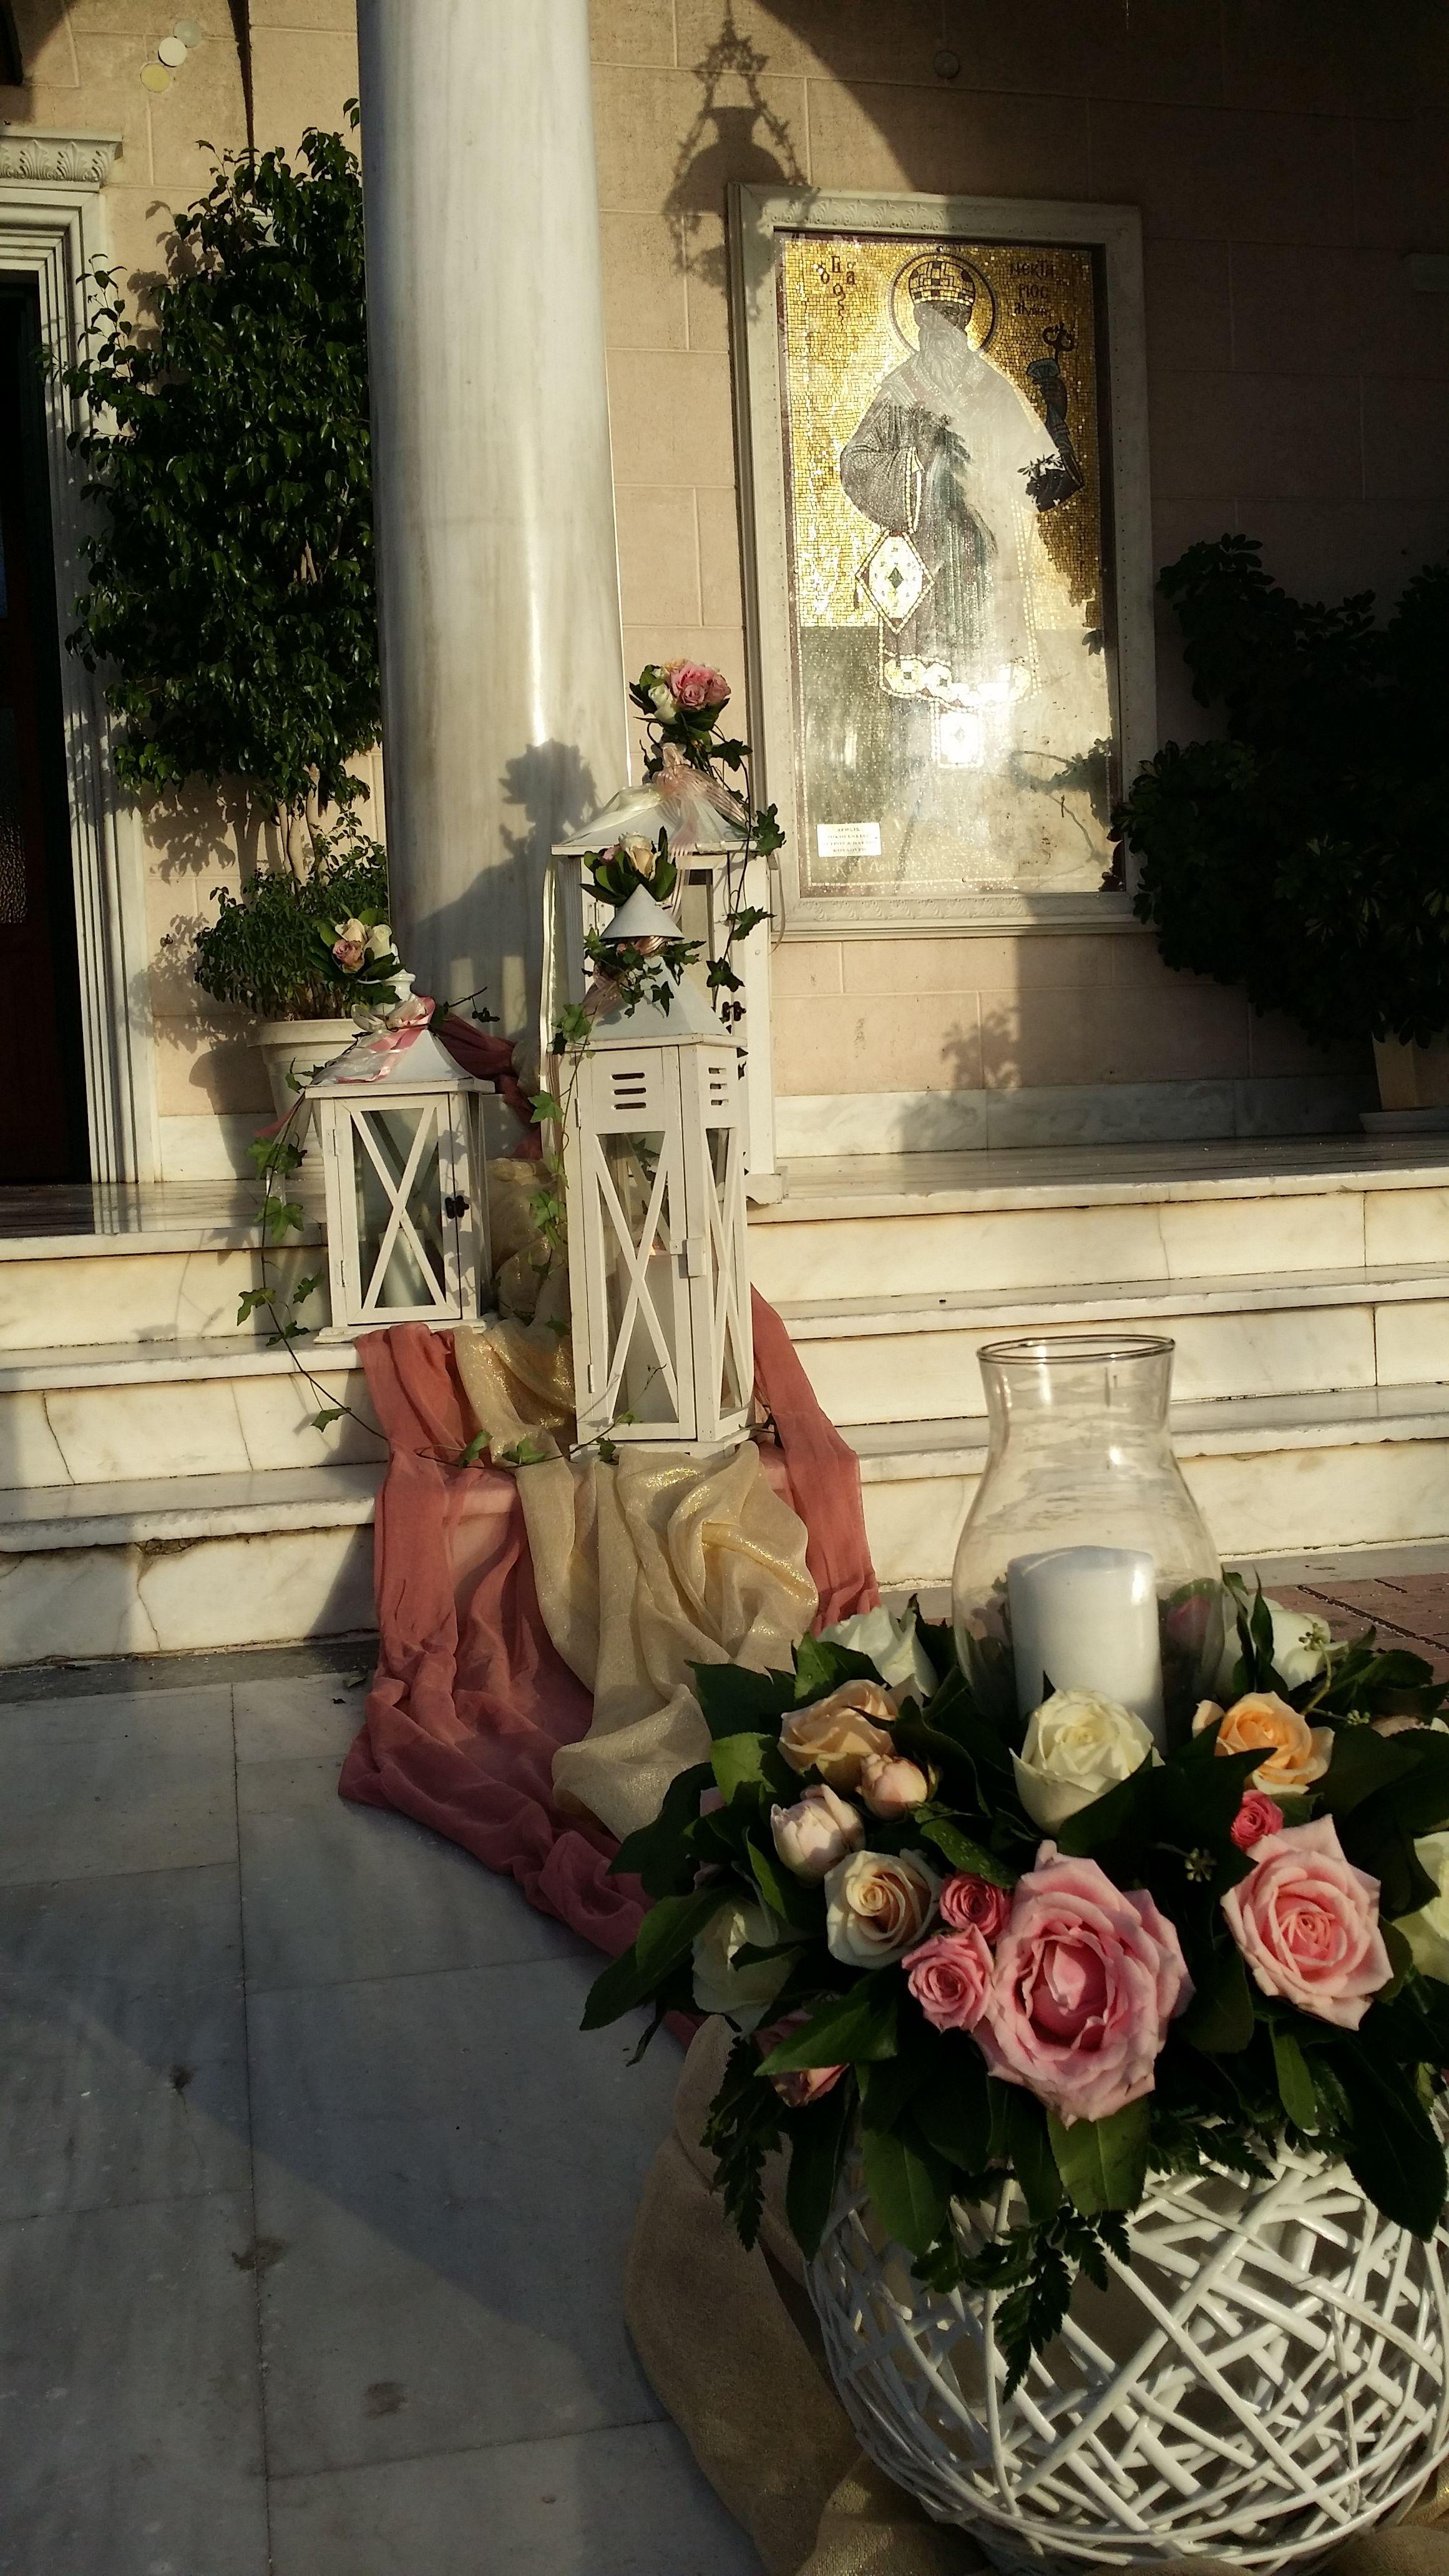 9c92a38a6aa1 Ο εξωτερικός στολισμός του γάμου σας στην εκκλησία περιλαμβάνει  τριαντάφυλλα